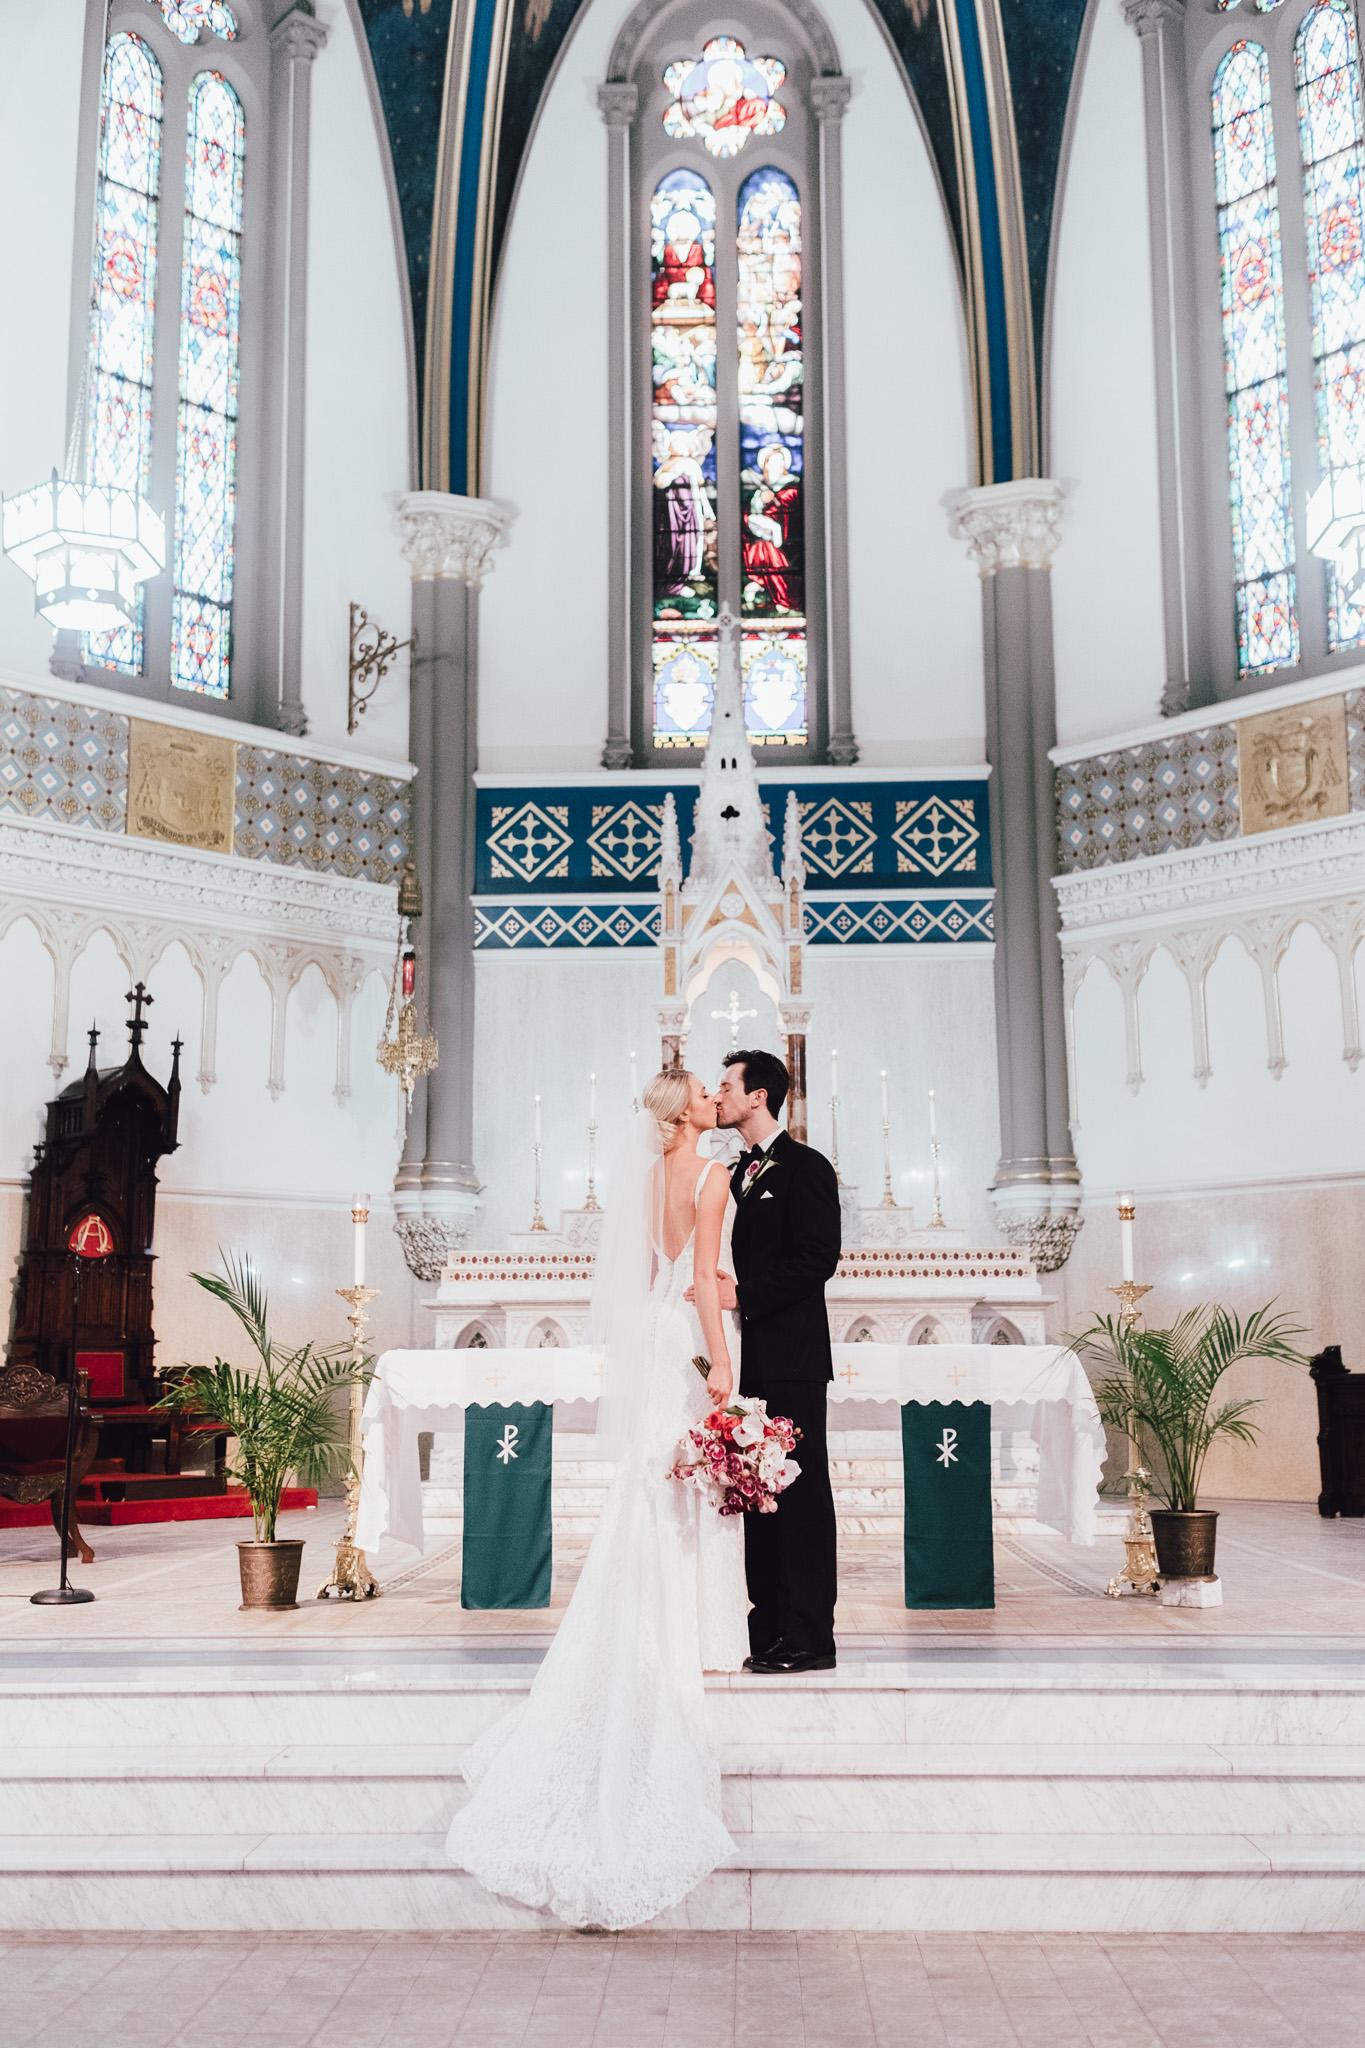 Brooke-Kyle-Indianapolis-Wedding-Blog-107.jpg